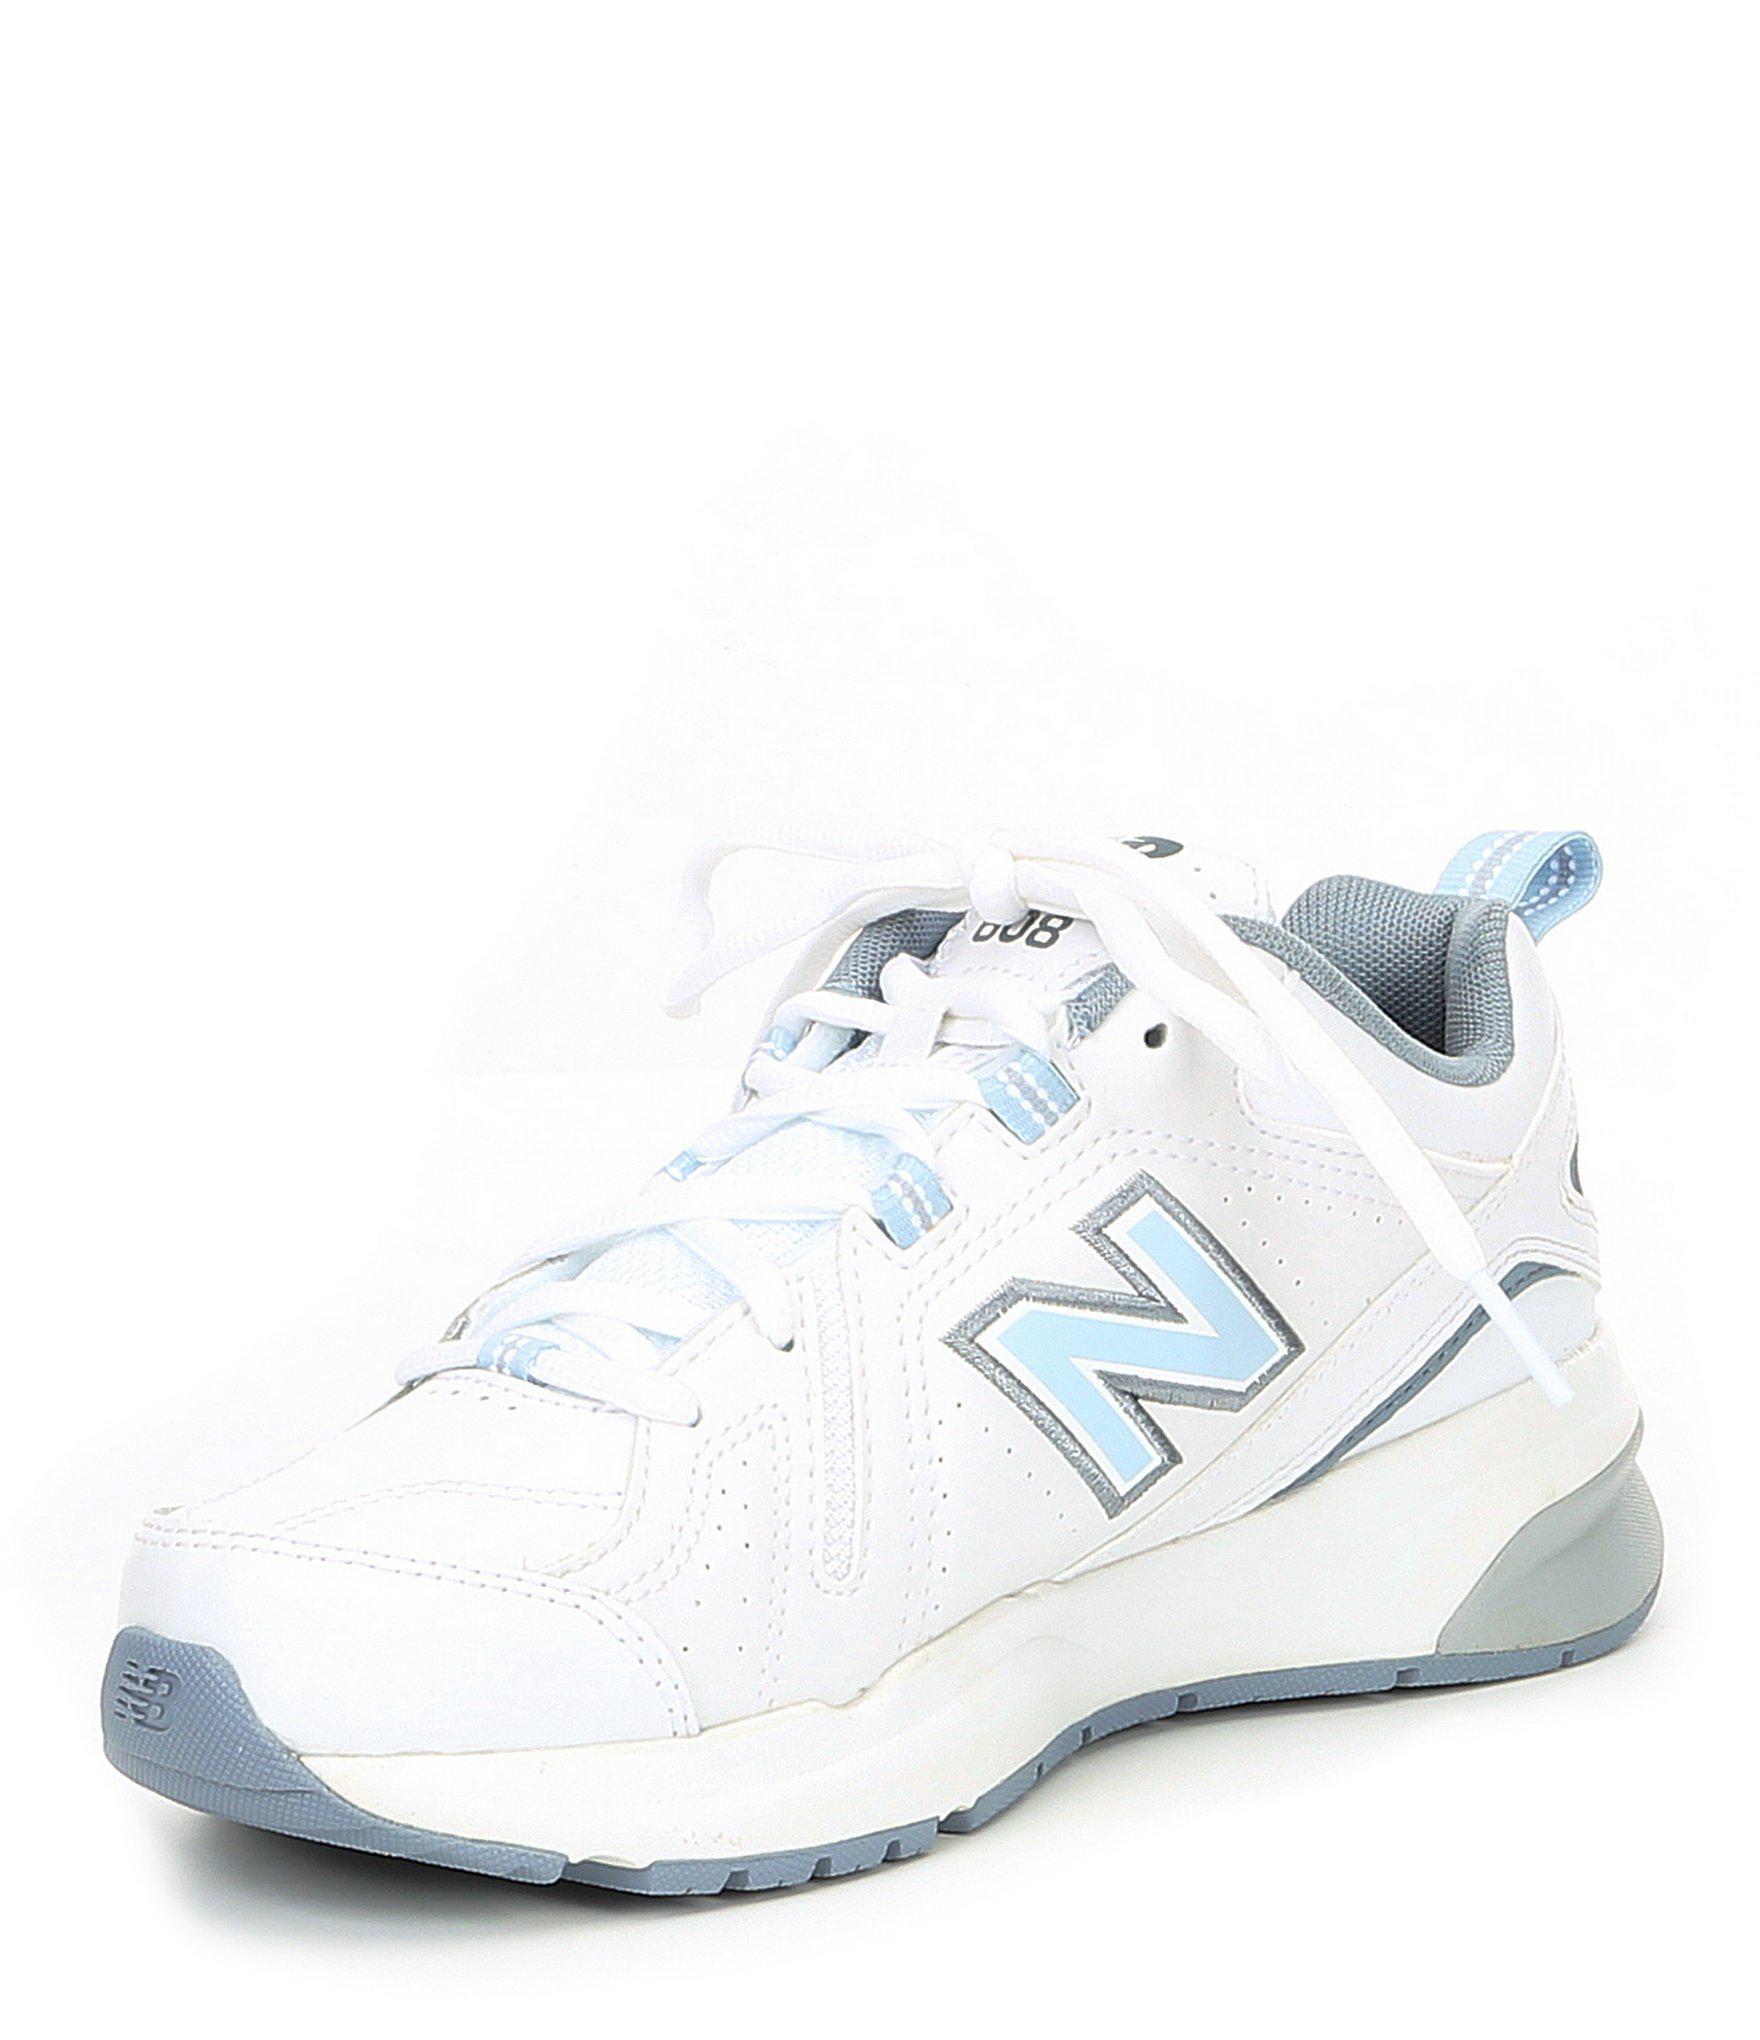 3b84f4012983 Lyst - New Balance Women s 608 V5 Training Shoe in Blue